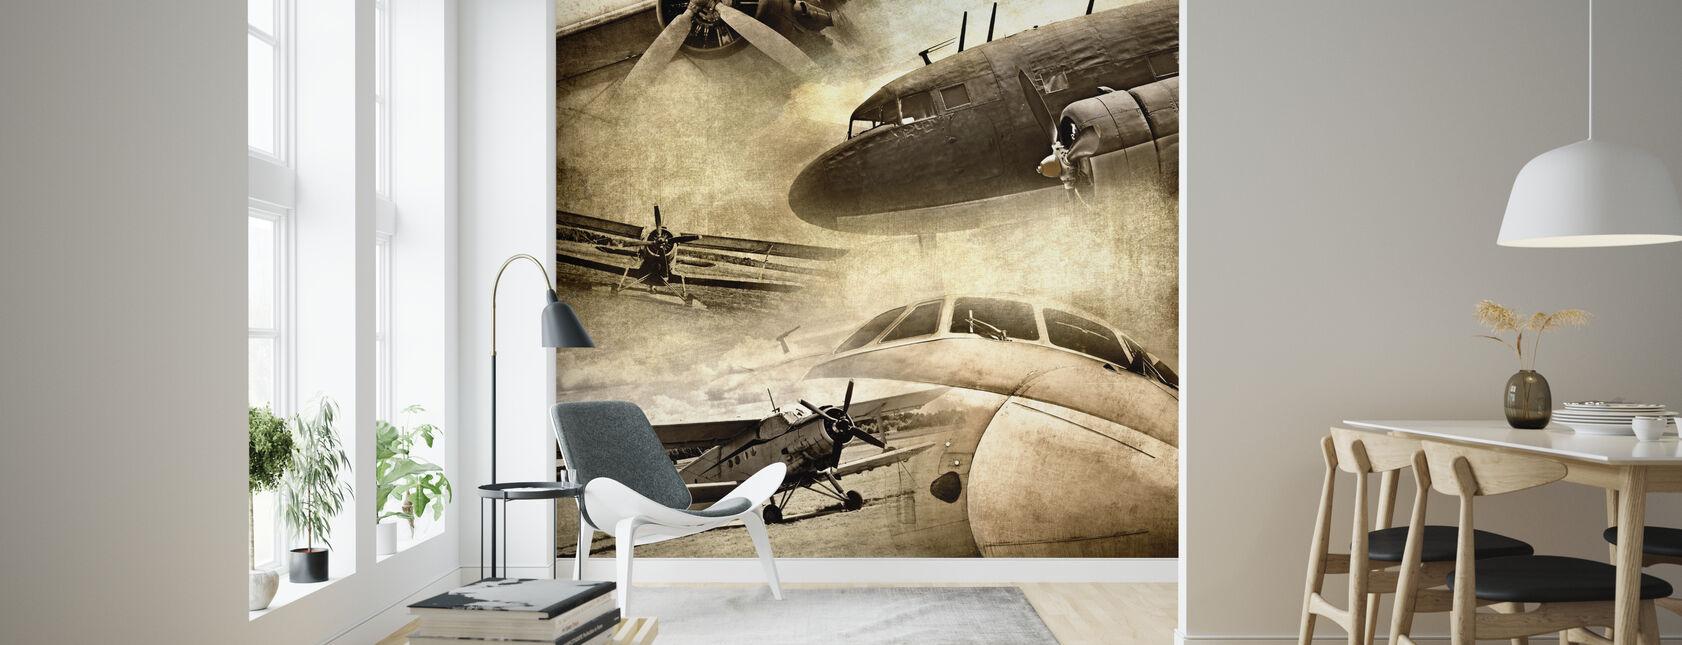 Retro Airplanes - Wallpaper - Living Room